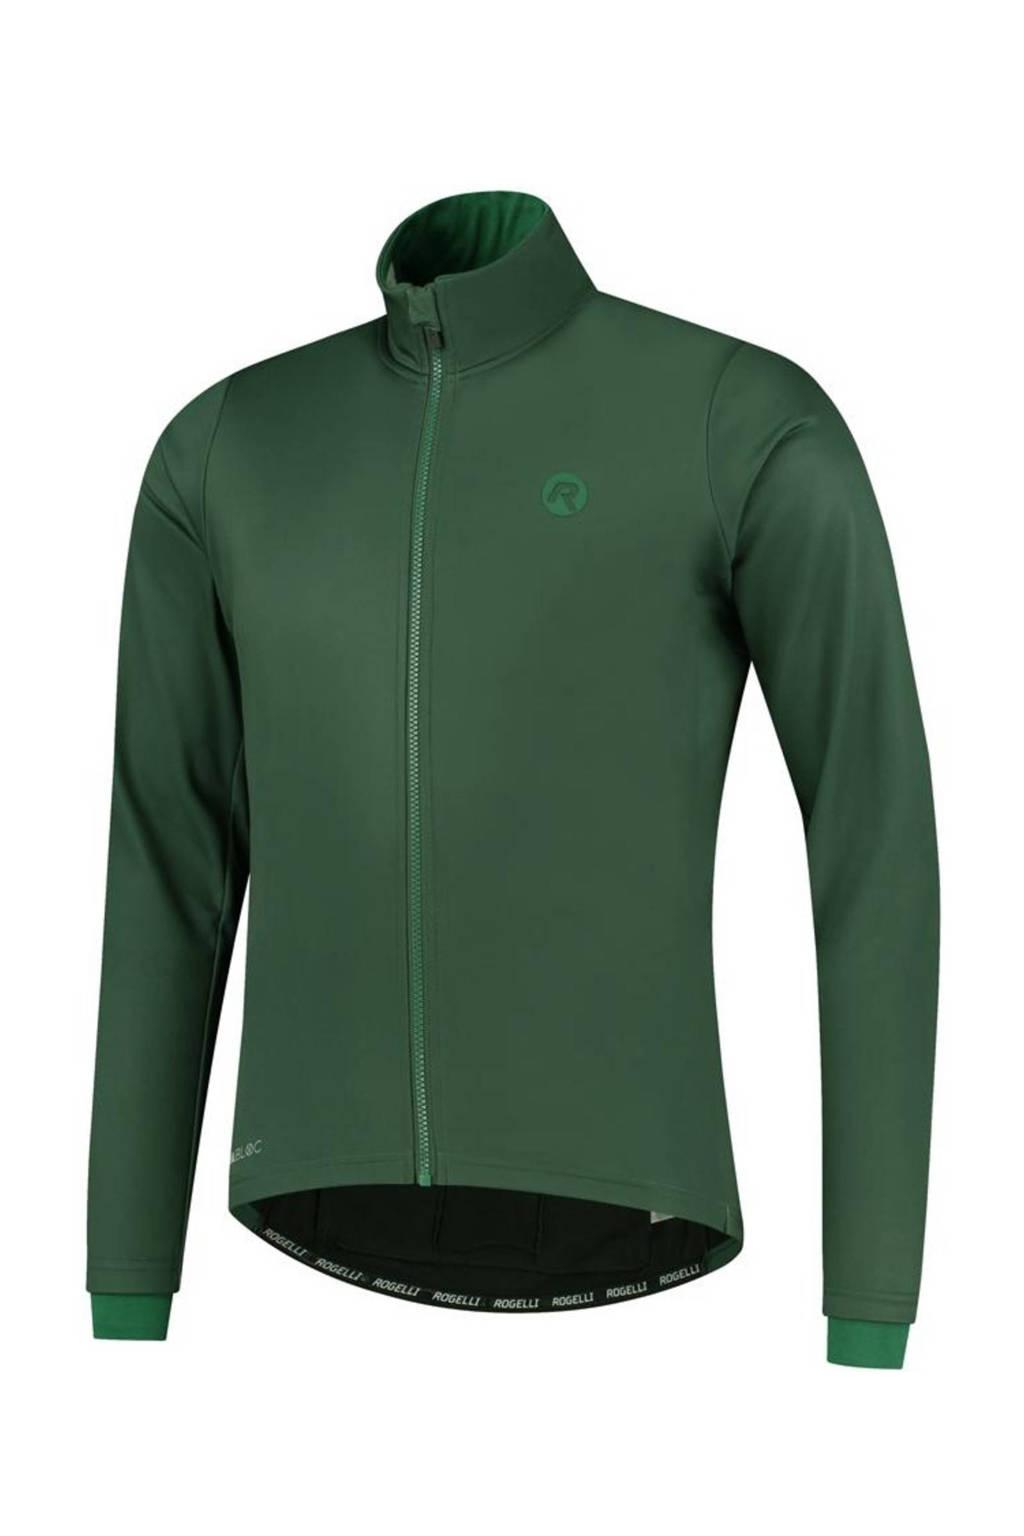 Rogelli   fietsjack Essential groen, Groen